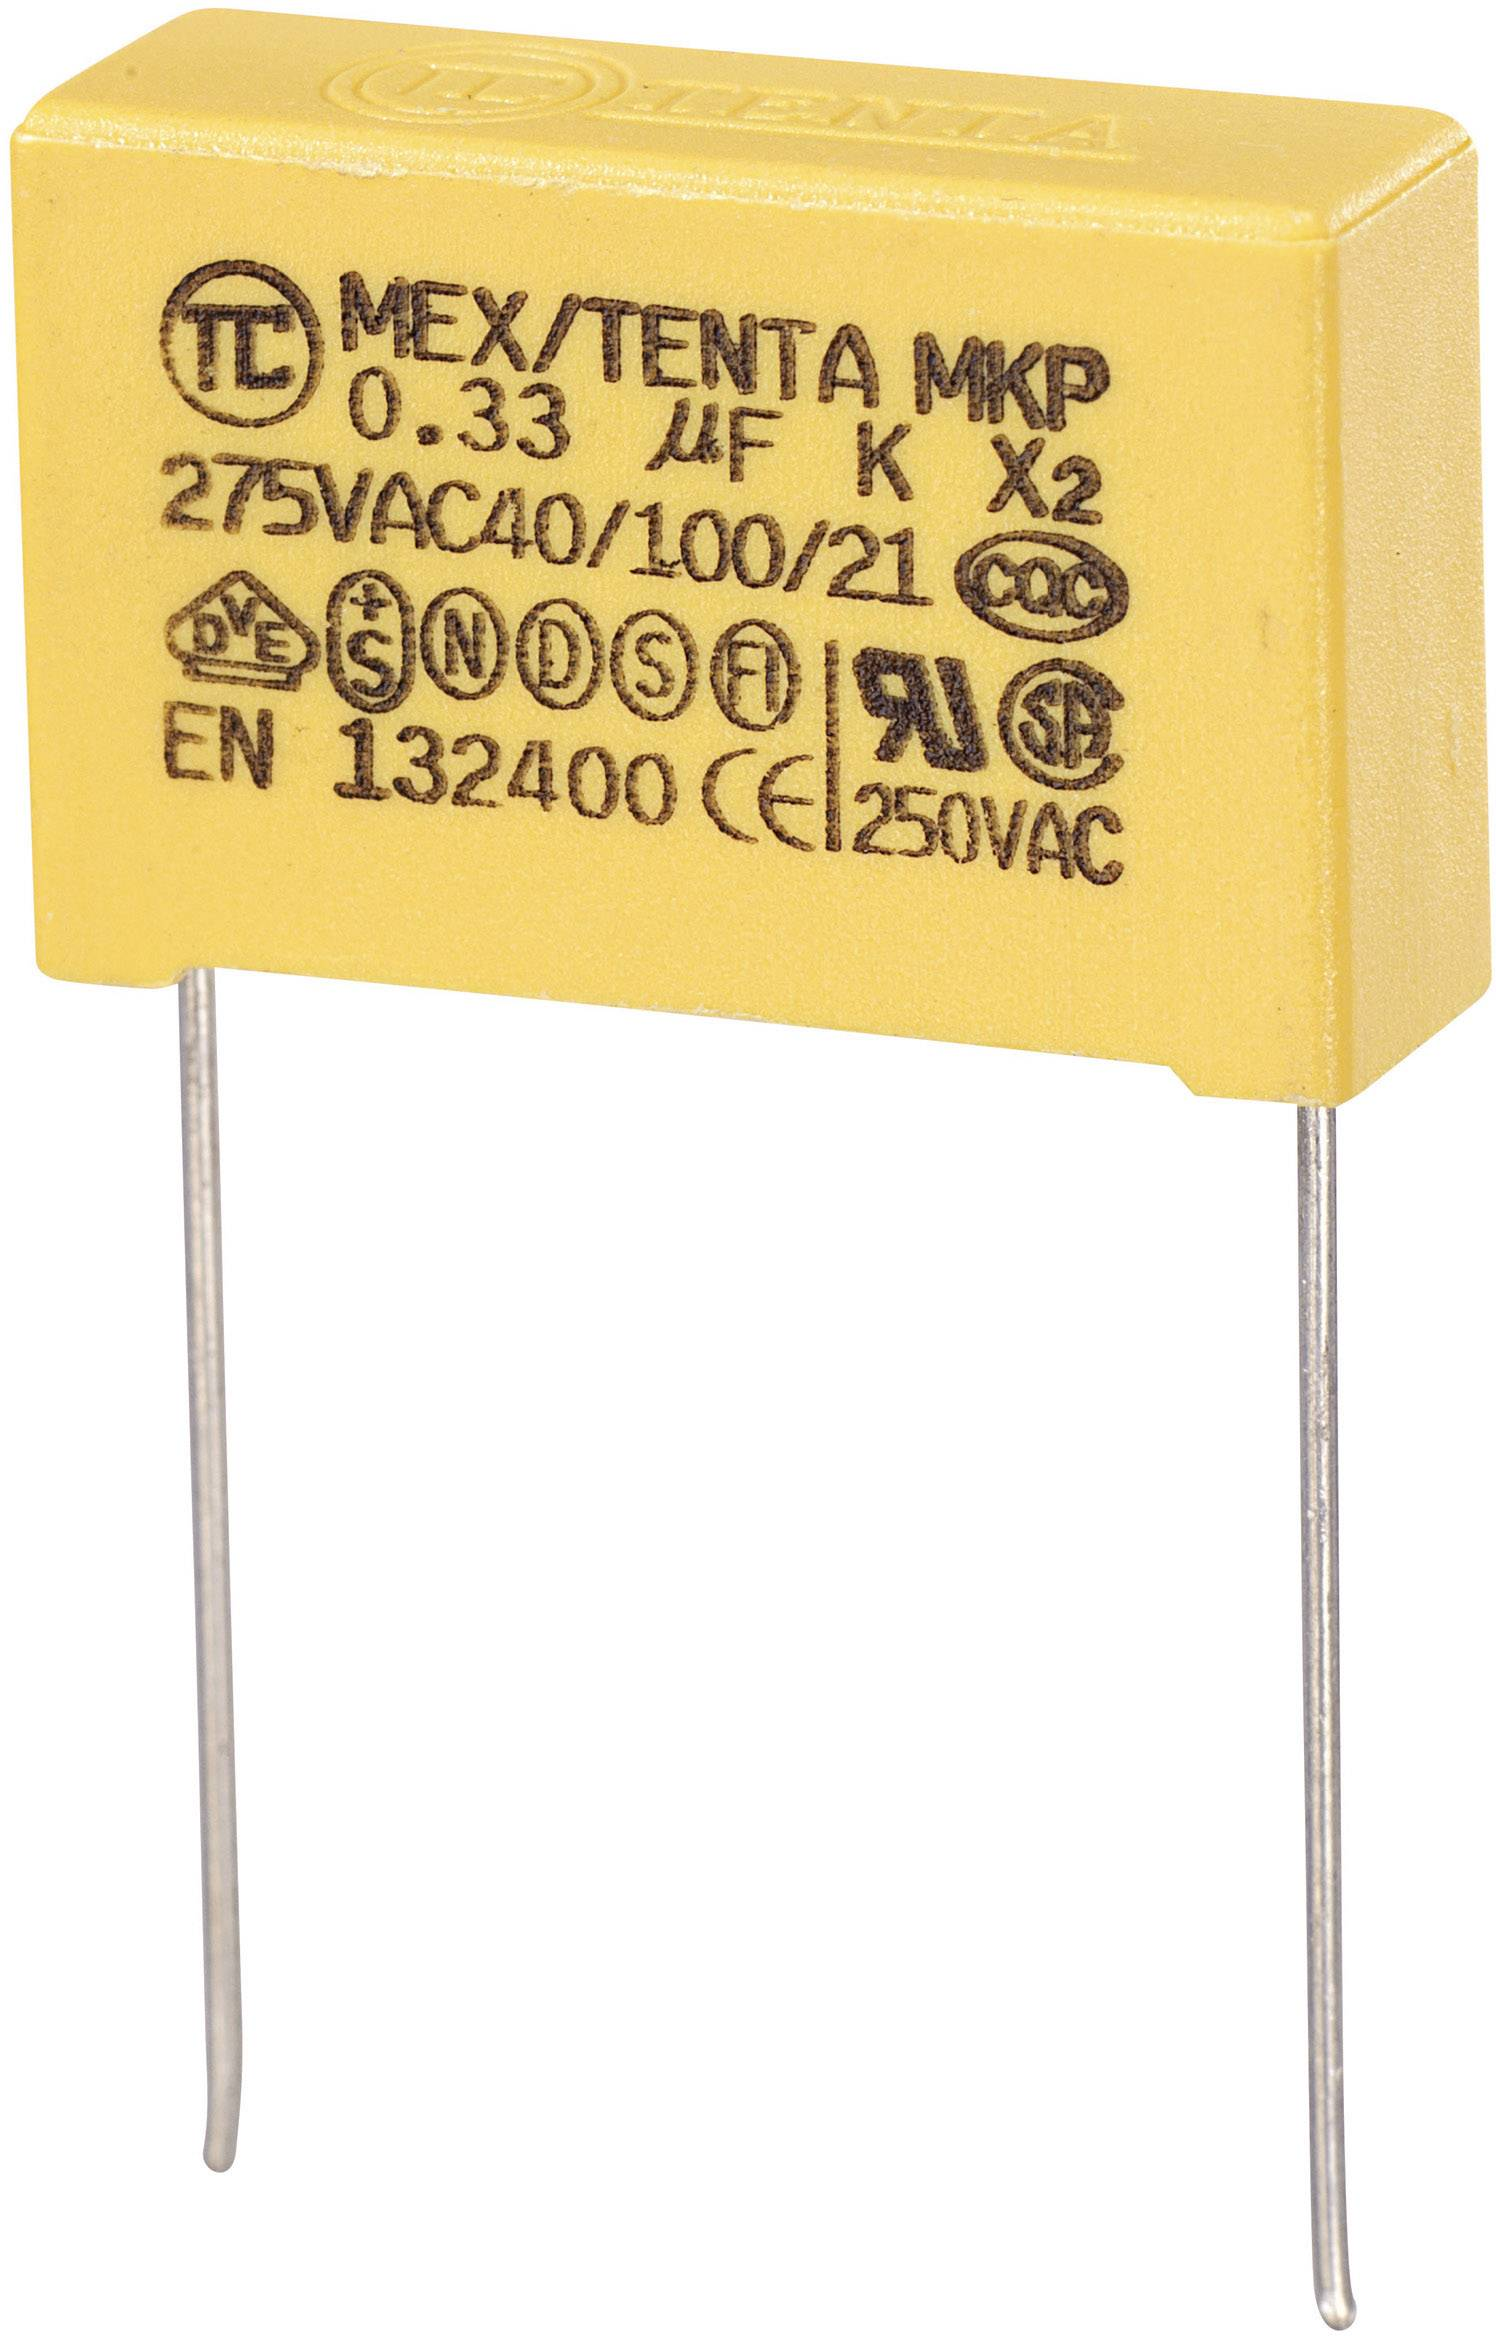 Foliový kondenzátor MKP, 0,33 µF, X2 275 V/AC, 10 %, 26,5 x 7 x 17 mm